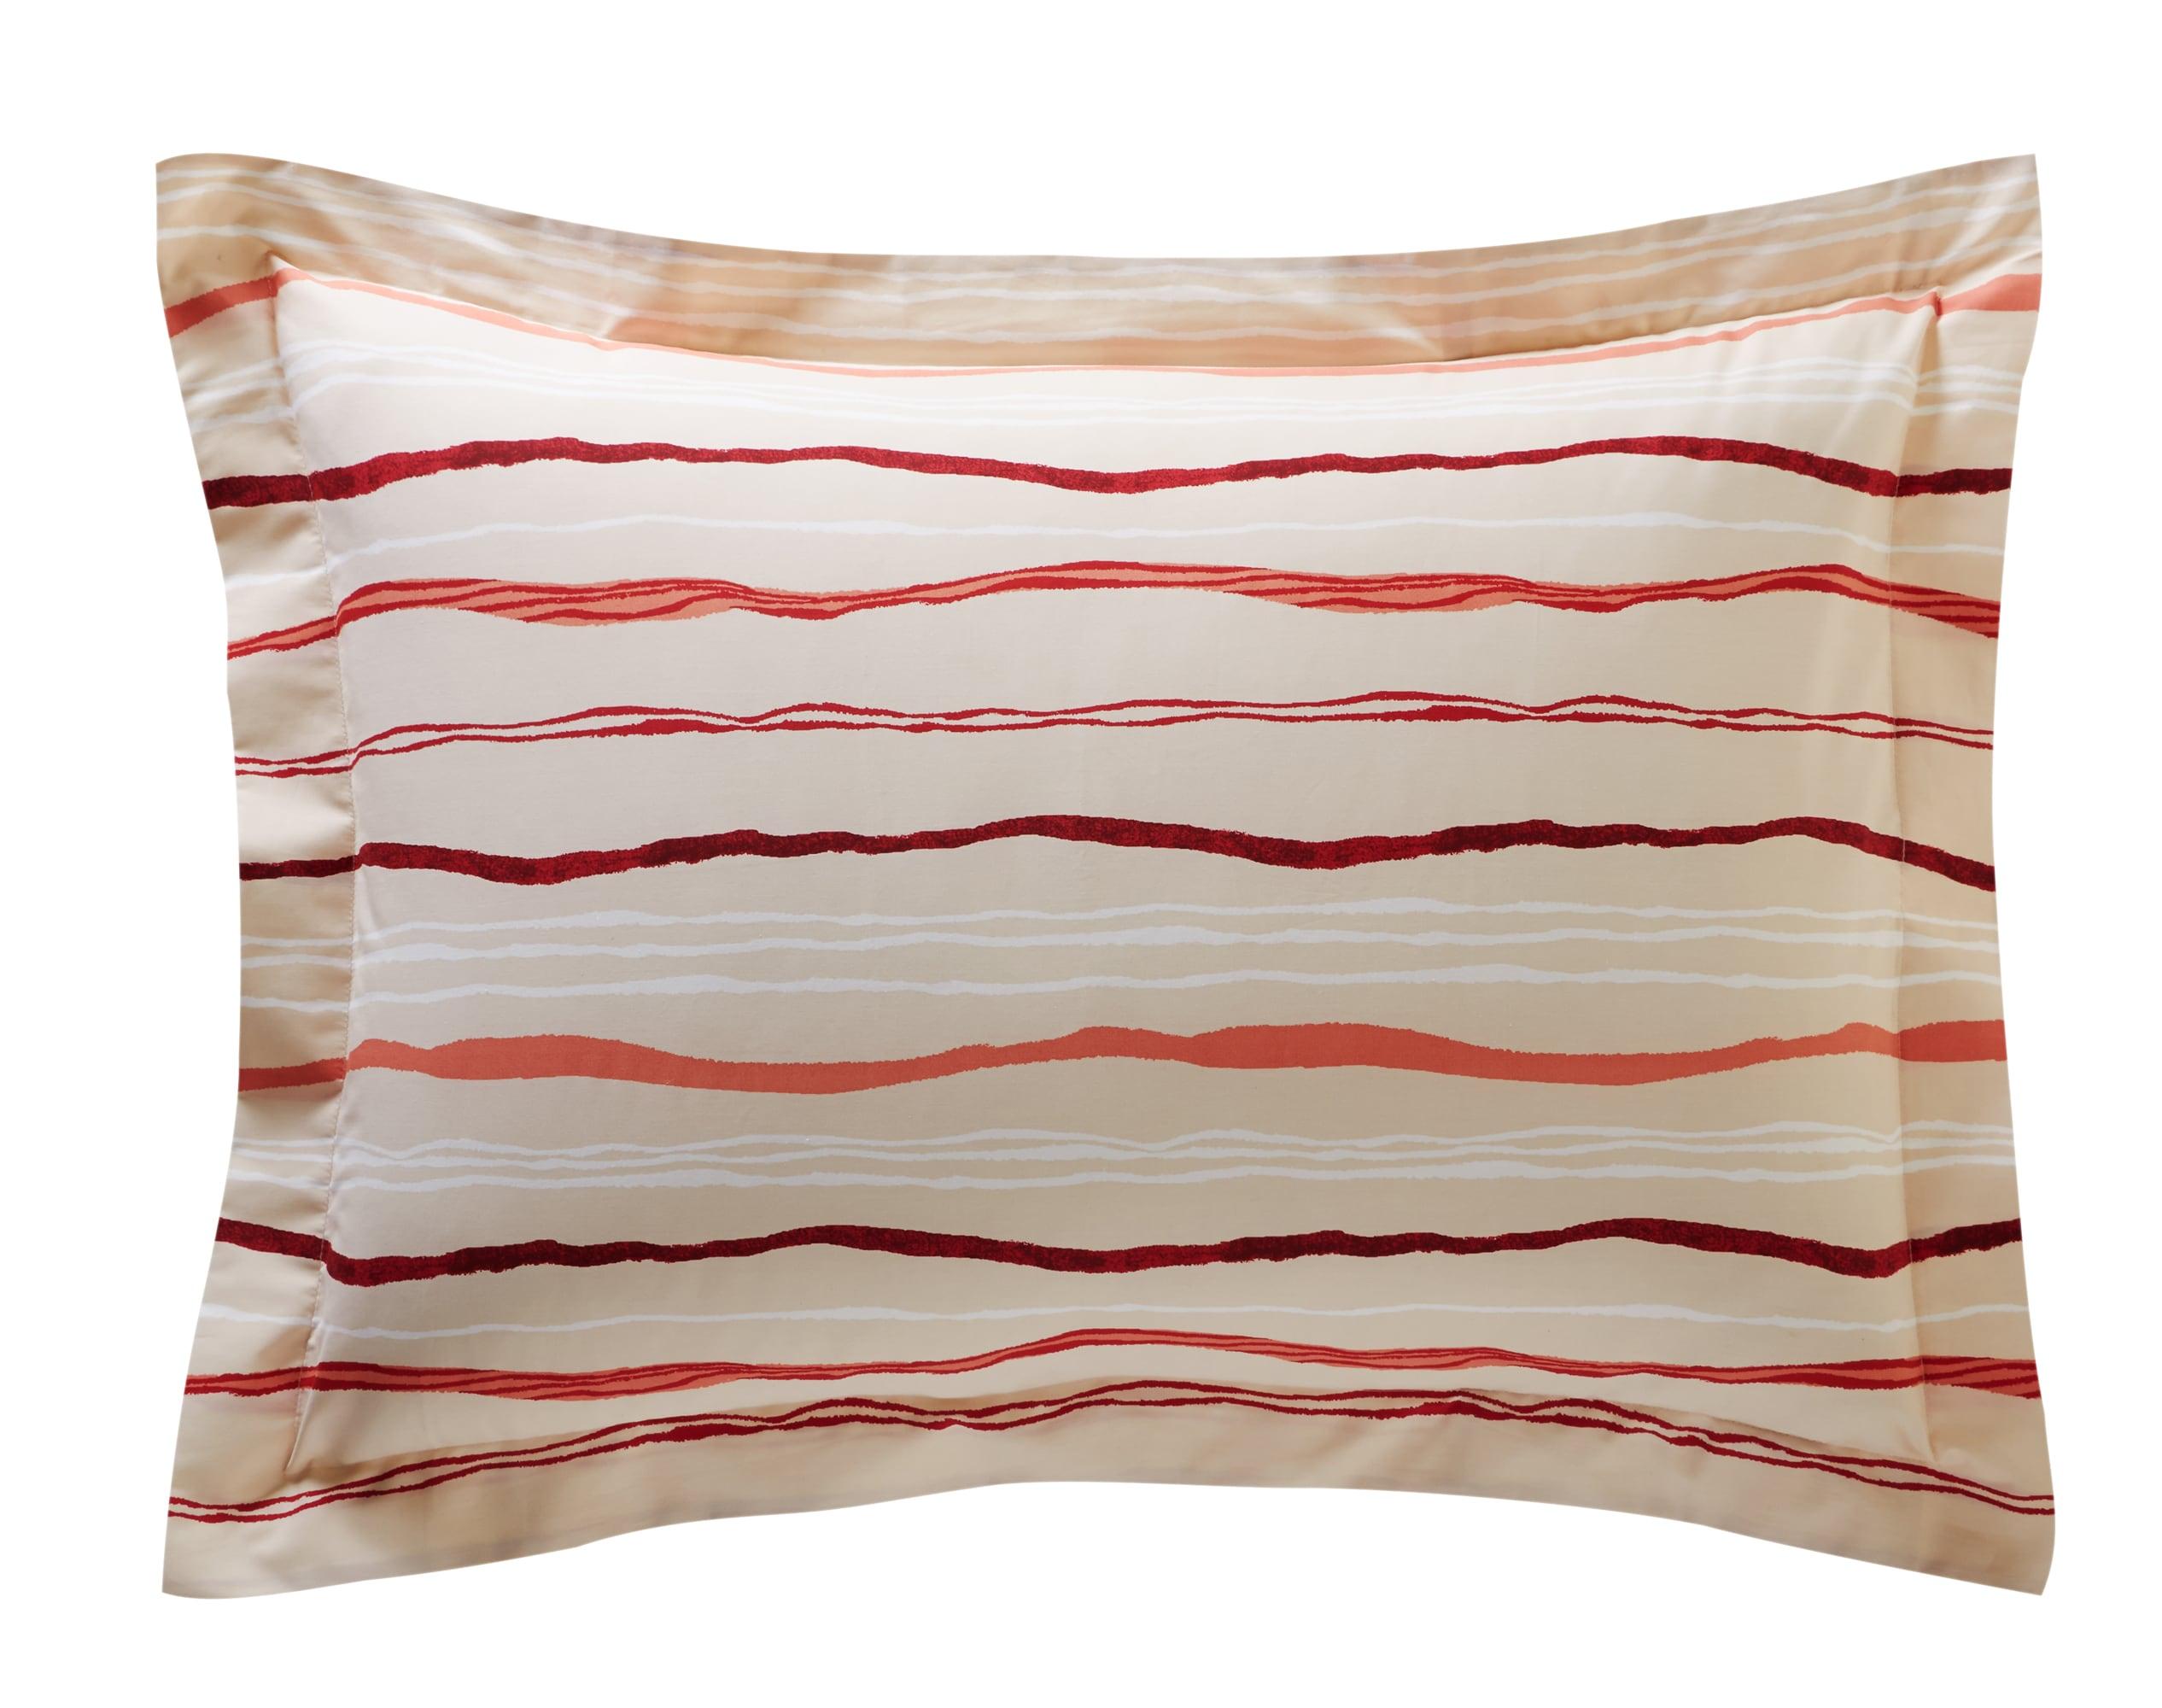 Taie d'oreiller rectangulaire en percale de coton orange corail